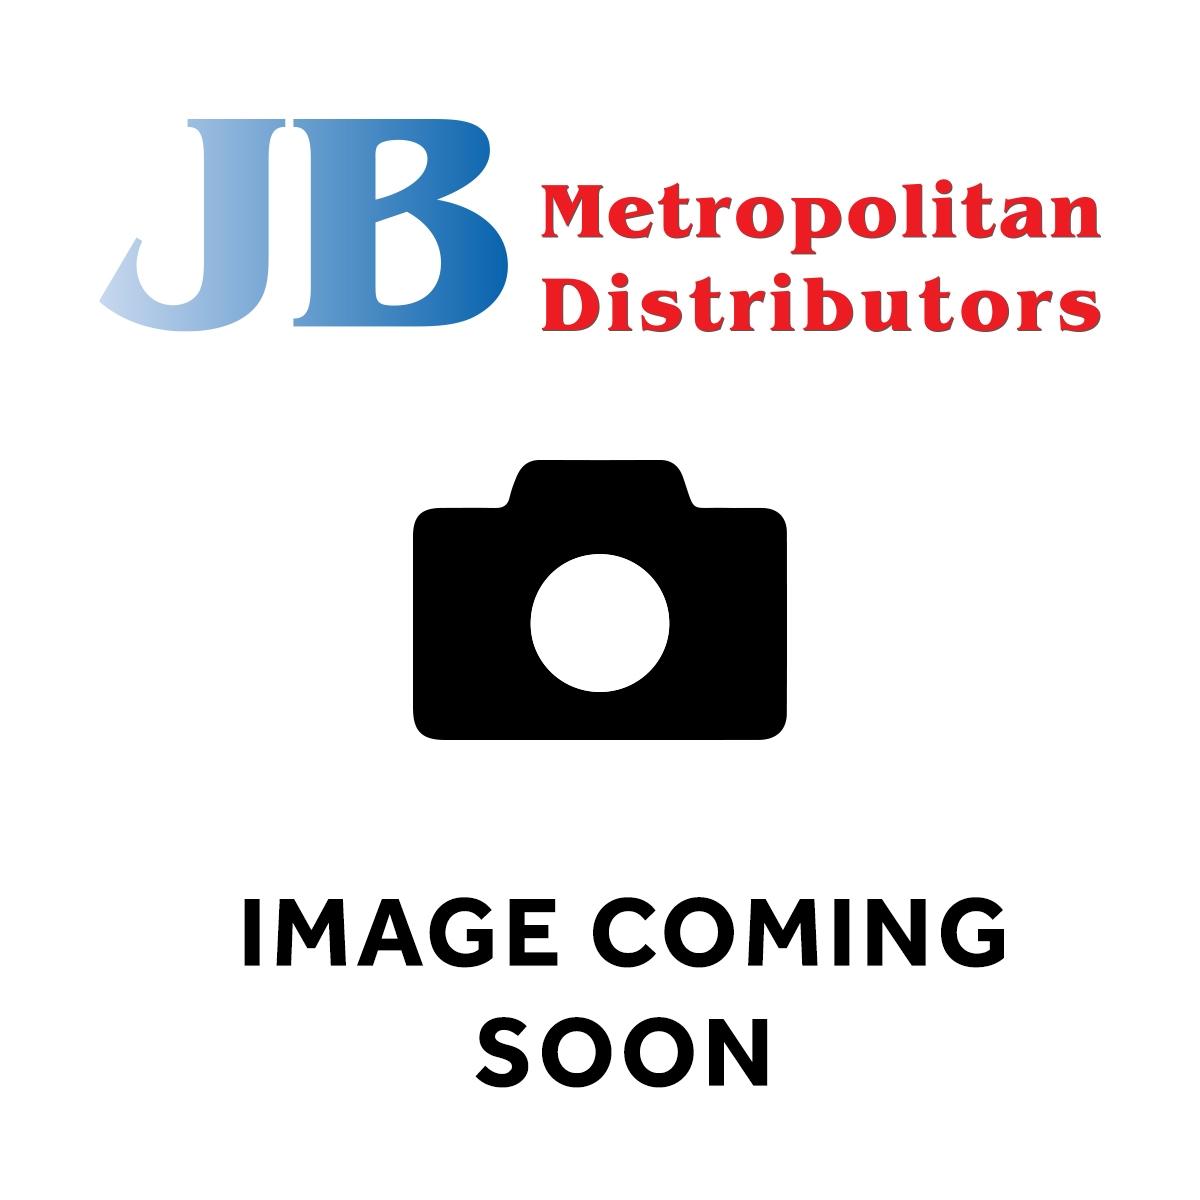 76G CADBURY TURKISH DELIGHT TWIN